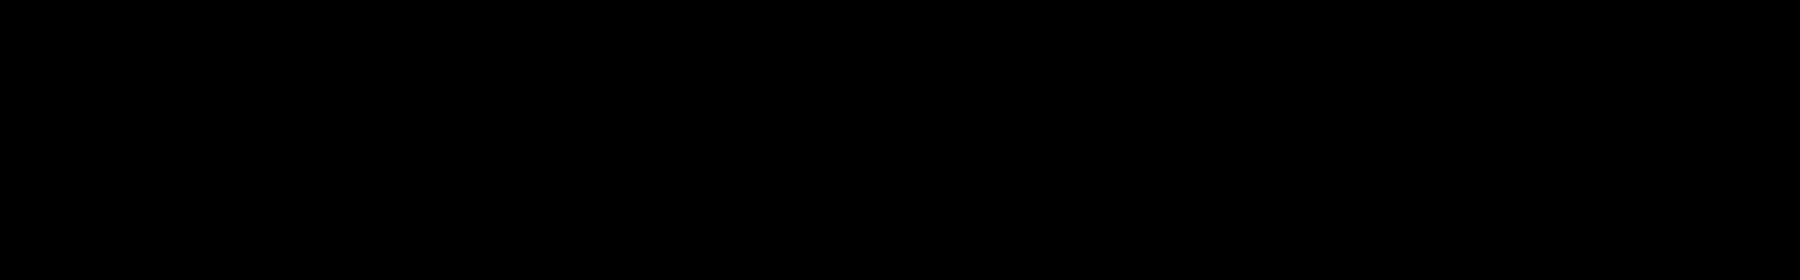 Chainflume audio waveform